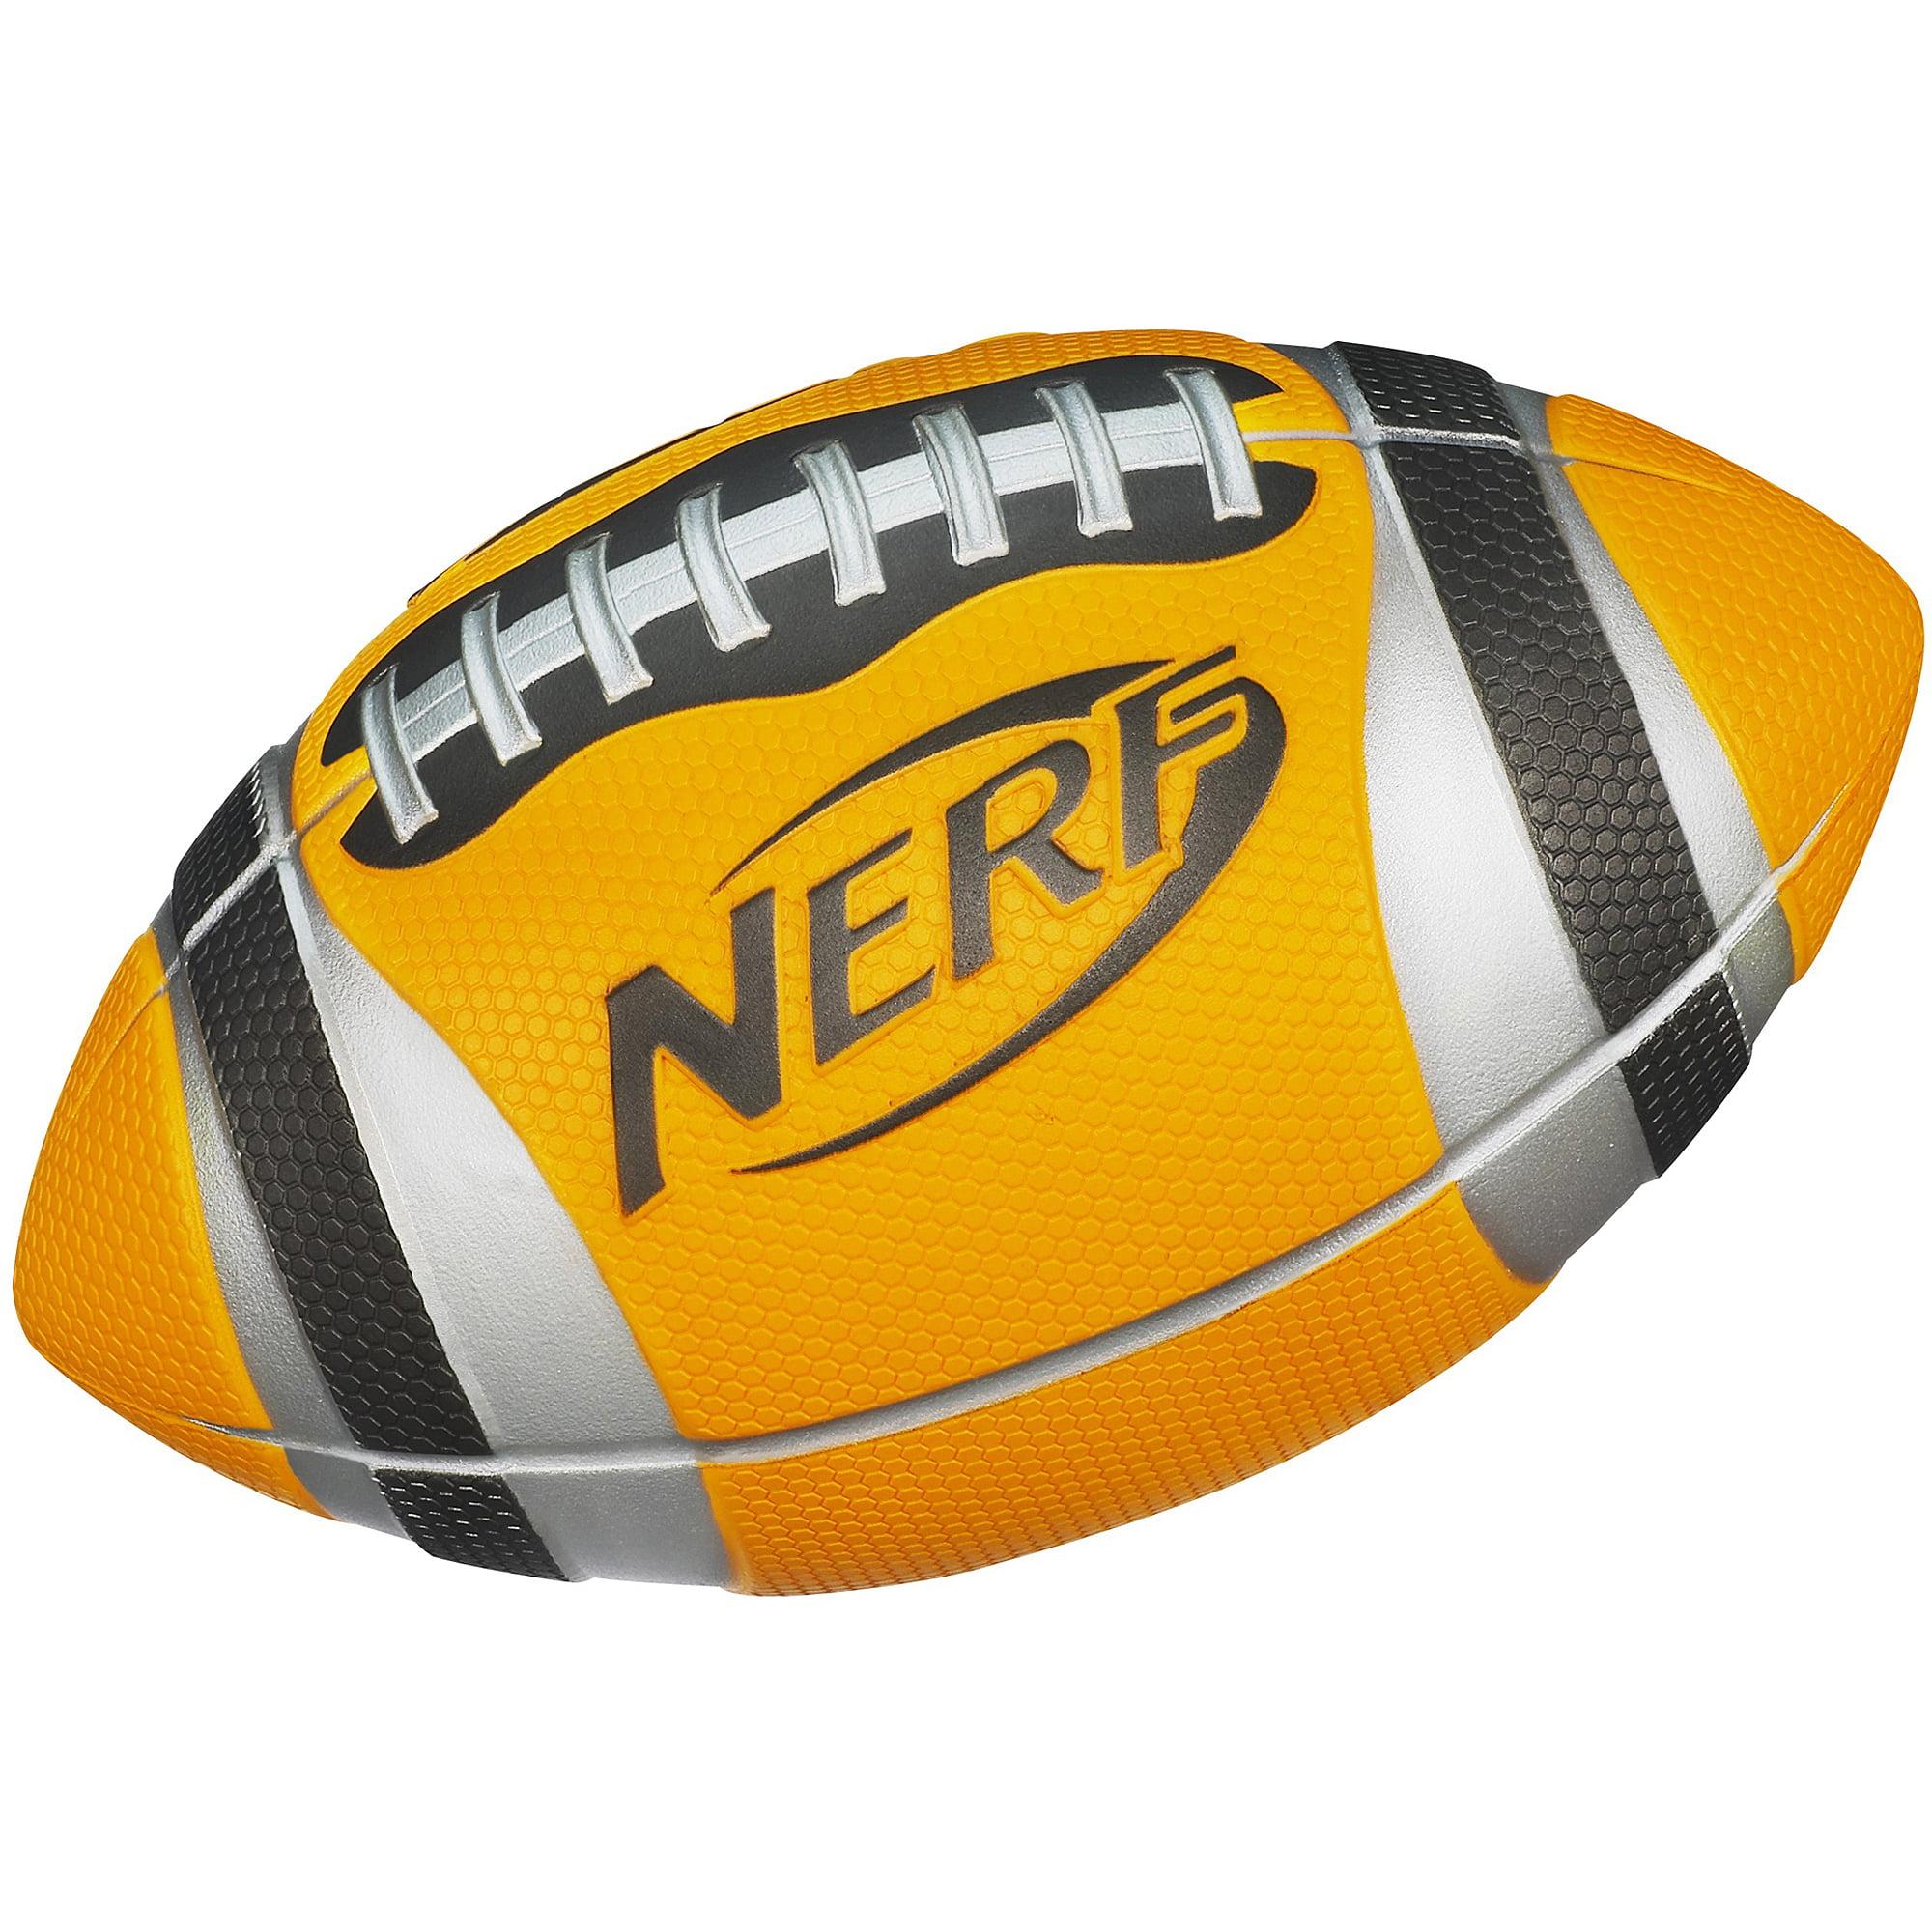 Nerf N-Sports Pro Grip Football